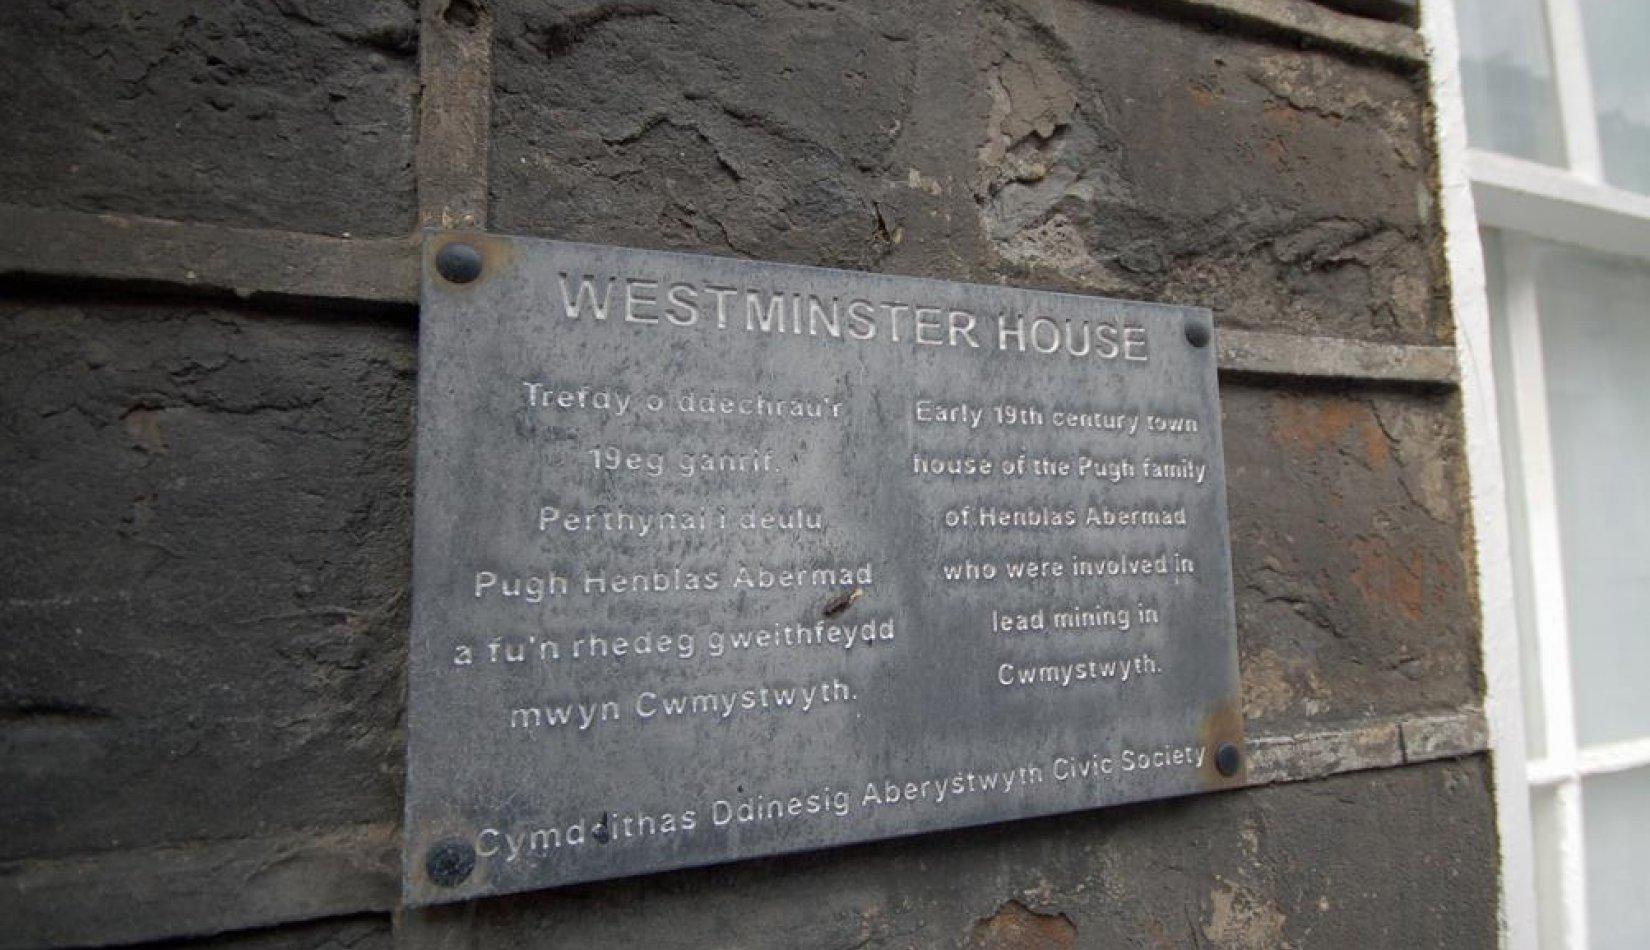 Westminster house - sign.jpg